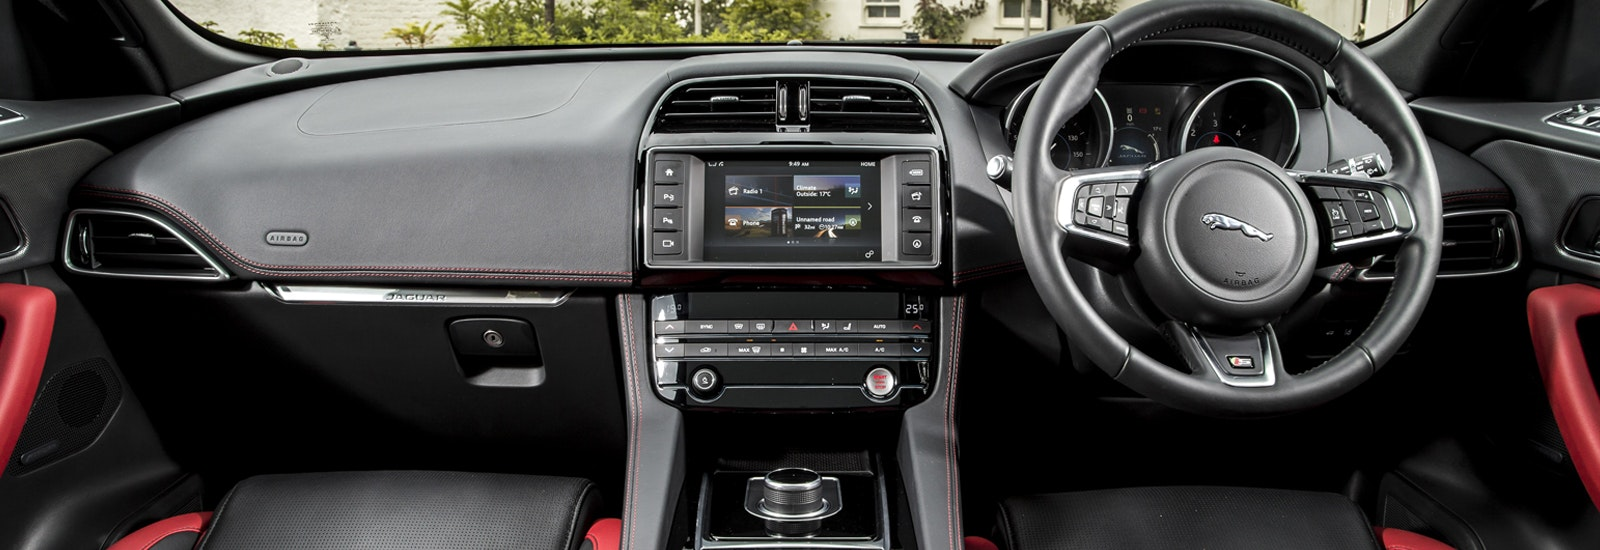 Jaguar E Pace Release Date >> 2018 Jaguar E-Pace price, specs and release date | carwow